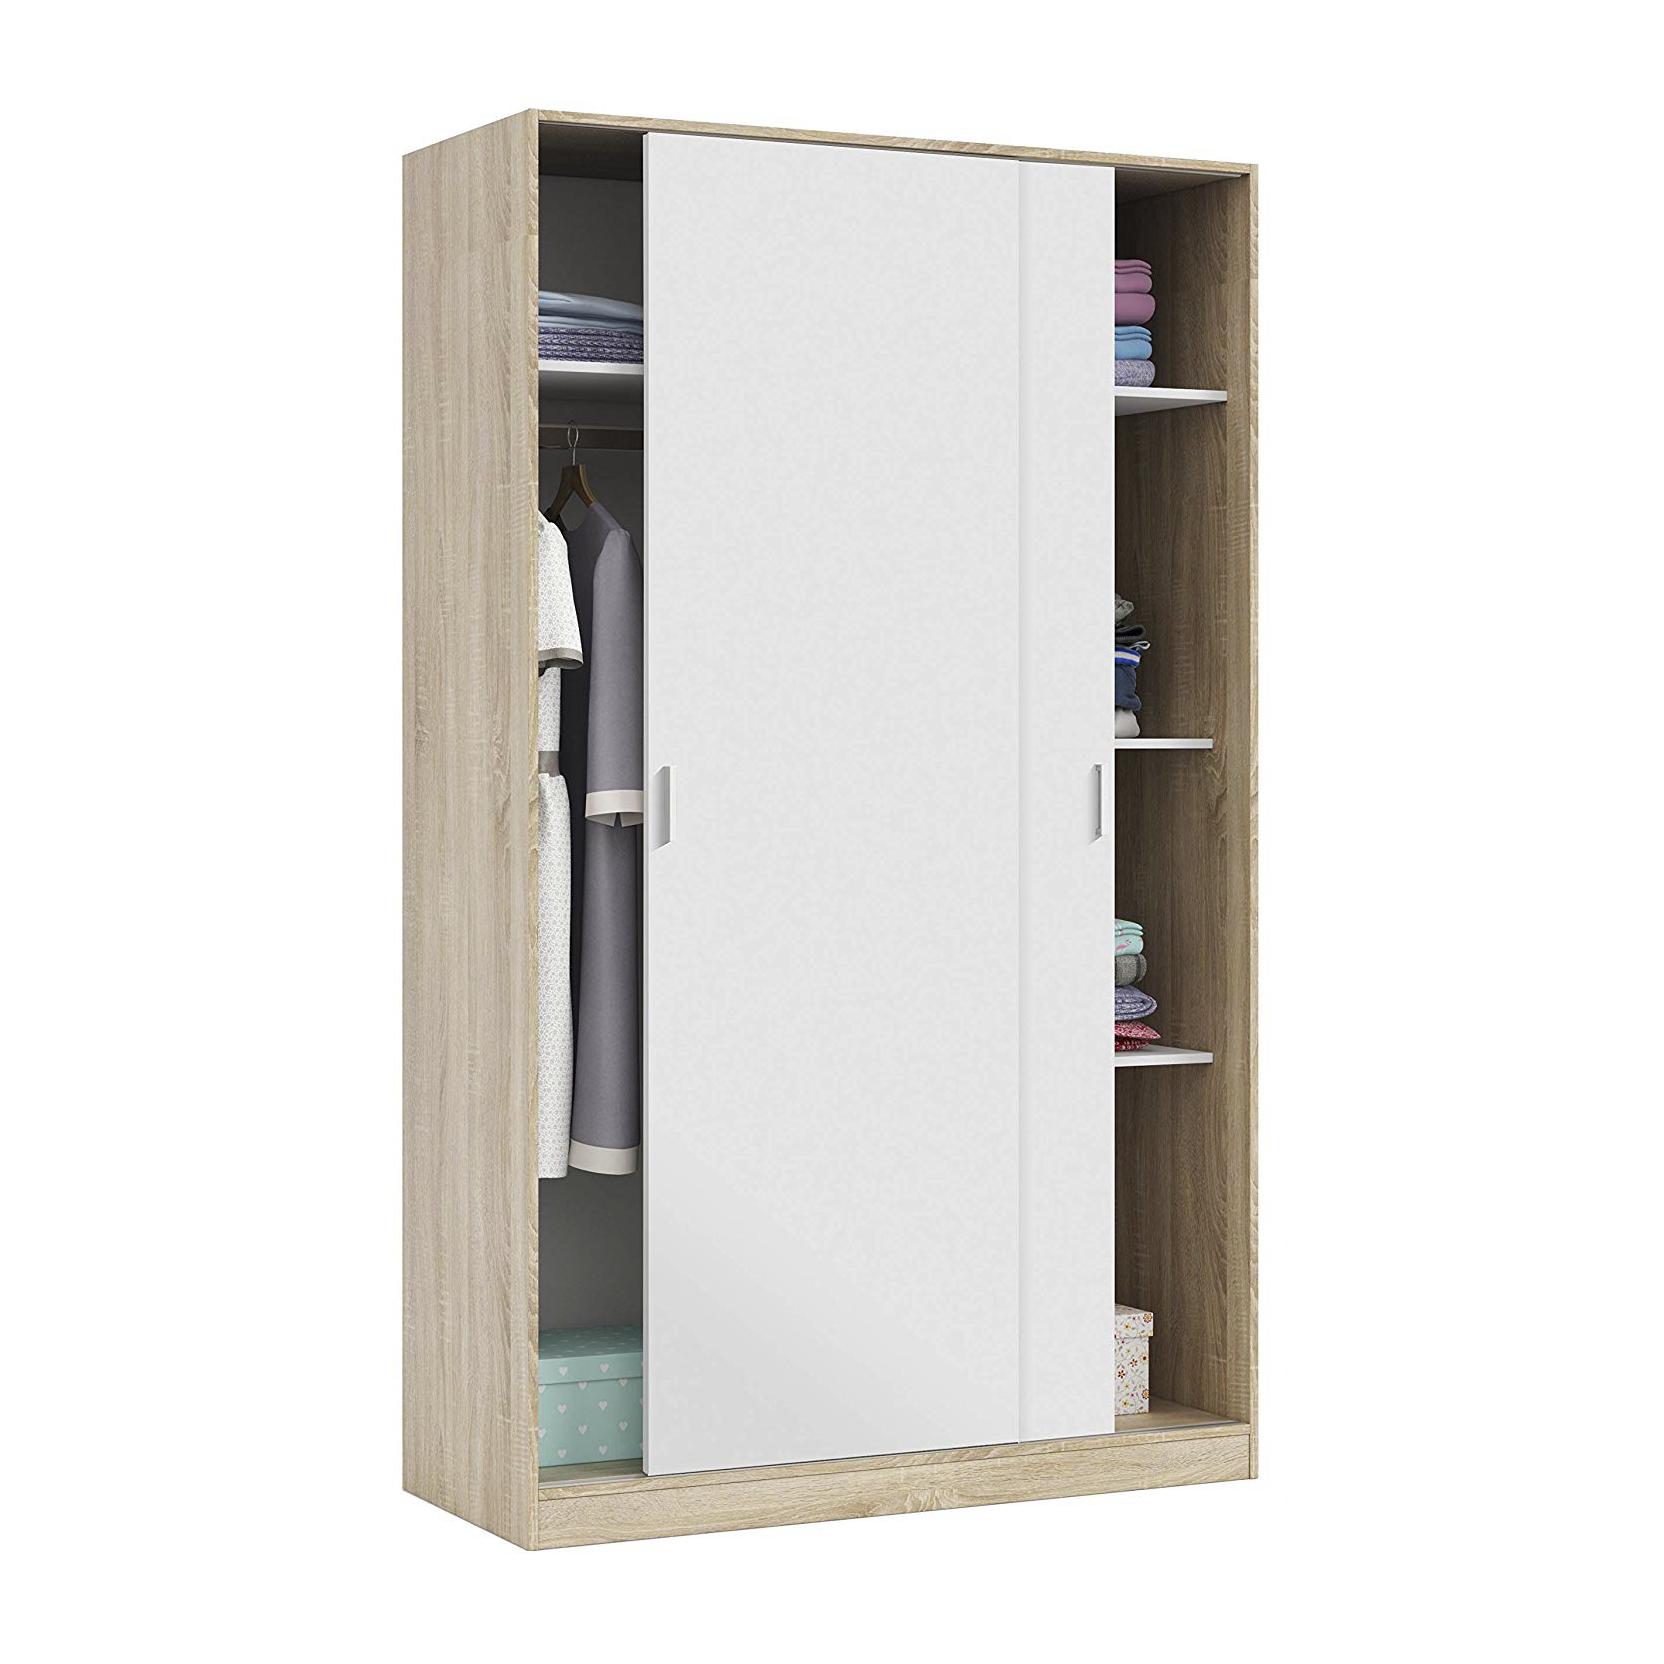 Kit armadio due ante scorrevoli – DELAIT – Design Light Decor